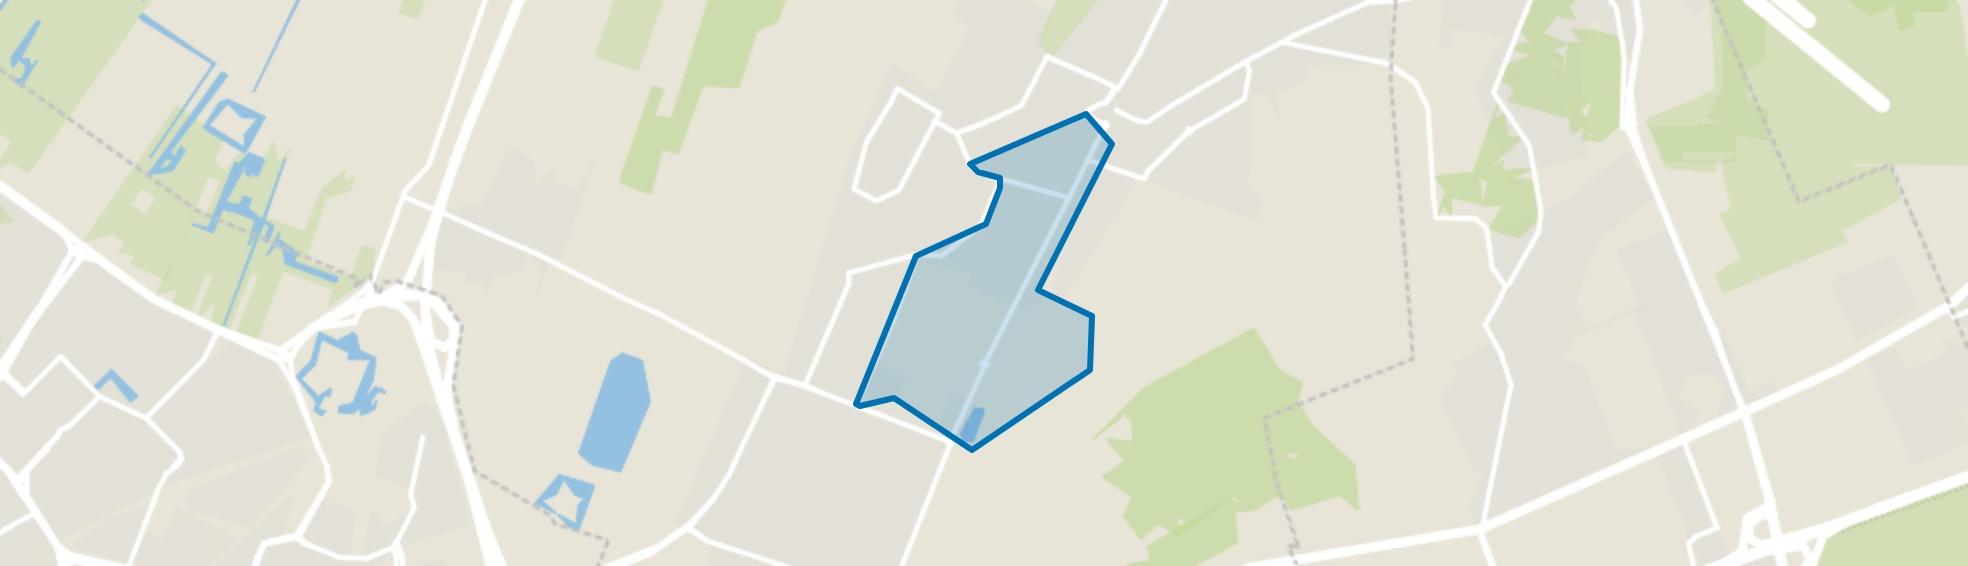 Tuindorp, Bilthoven map